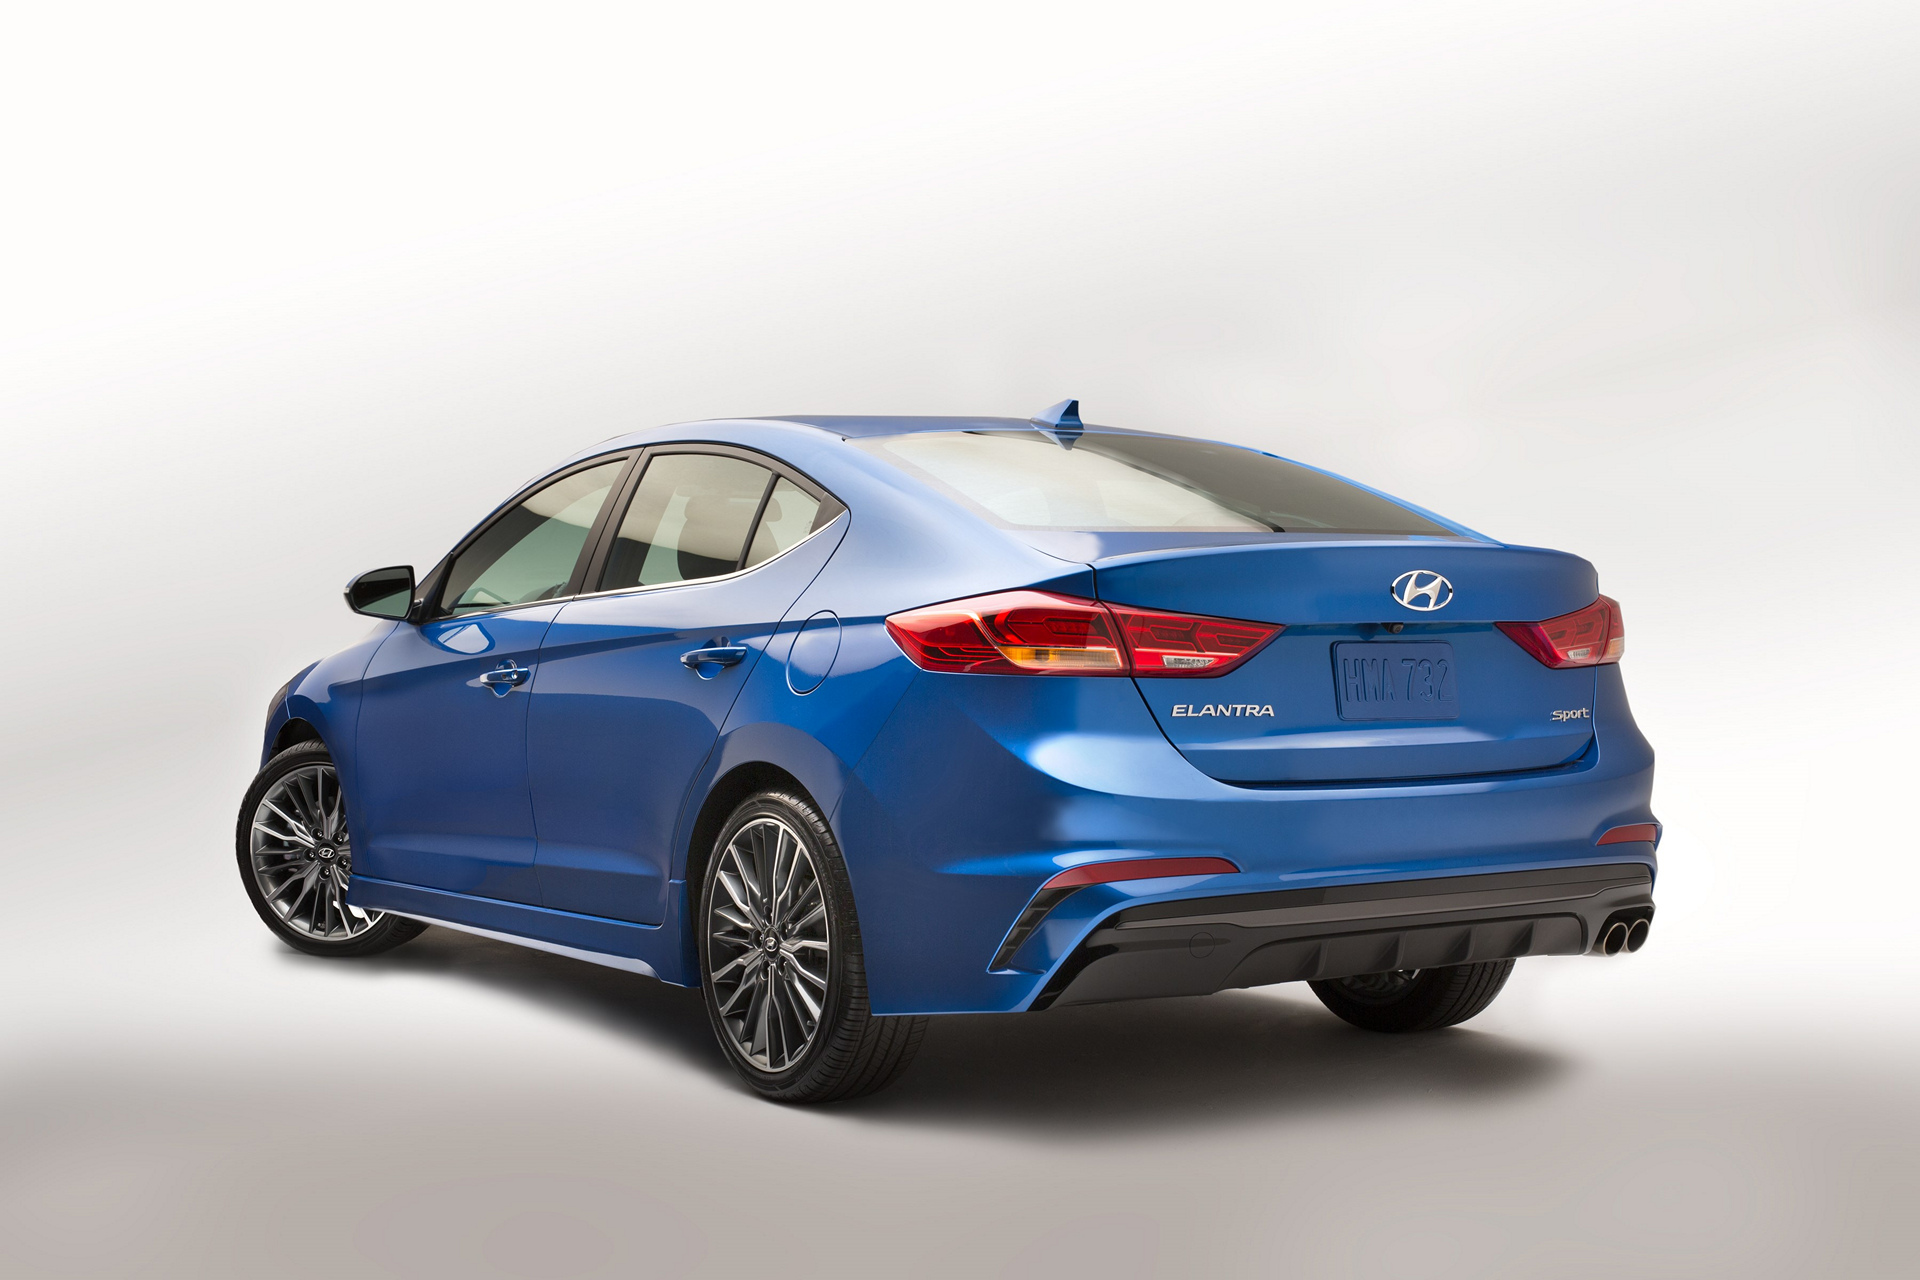 2017 Hyundai Elantra Sport © Hyundai Motor Company